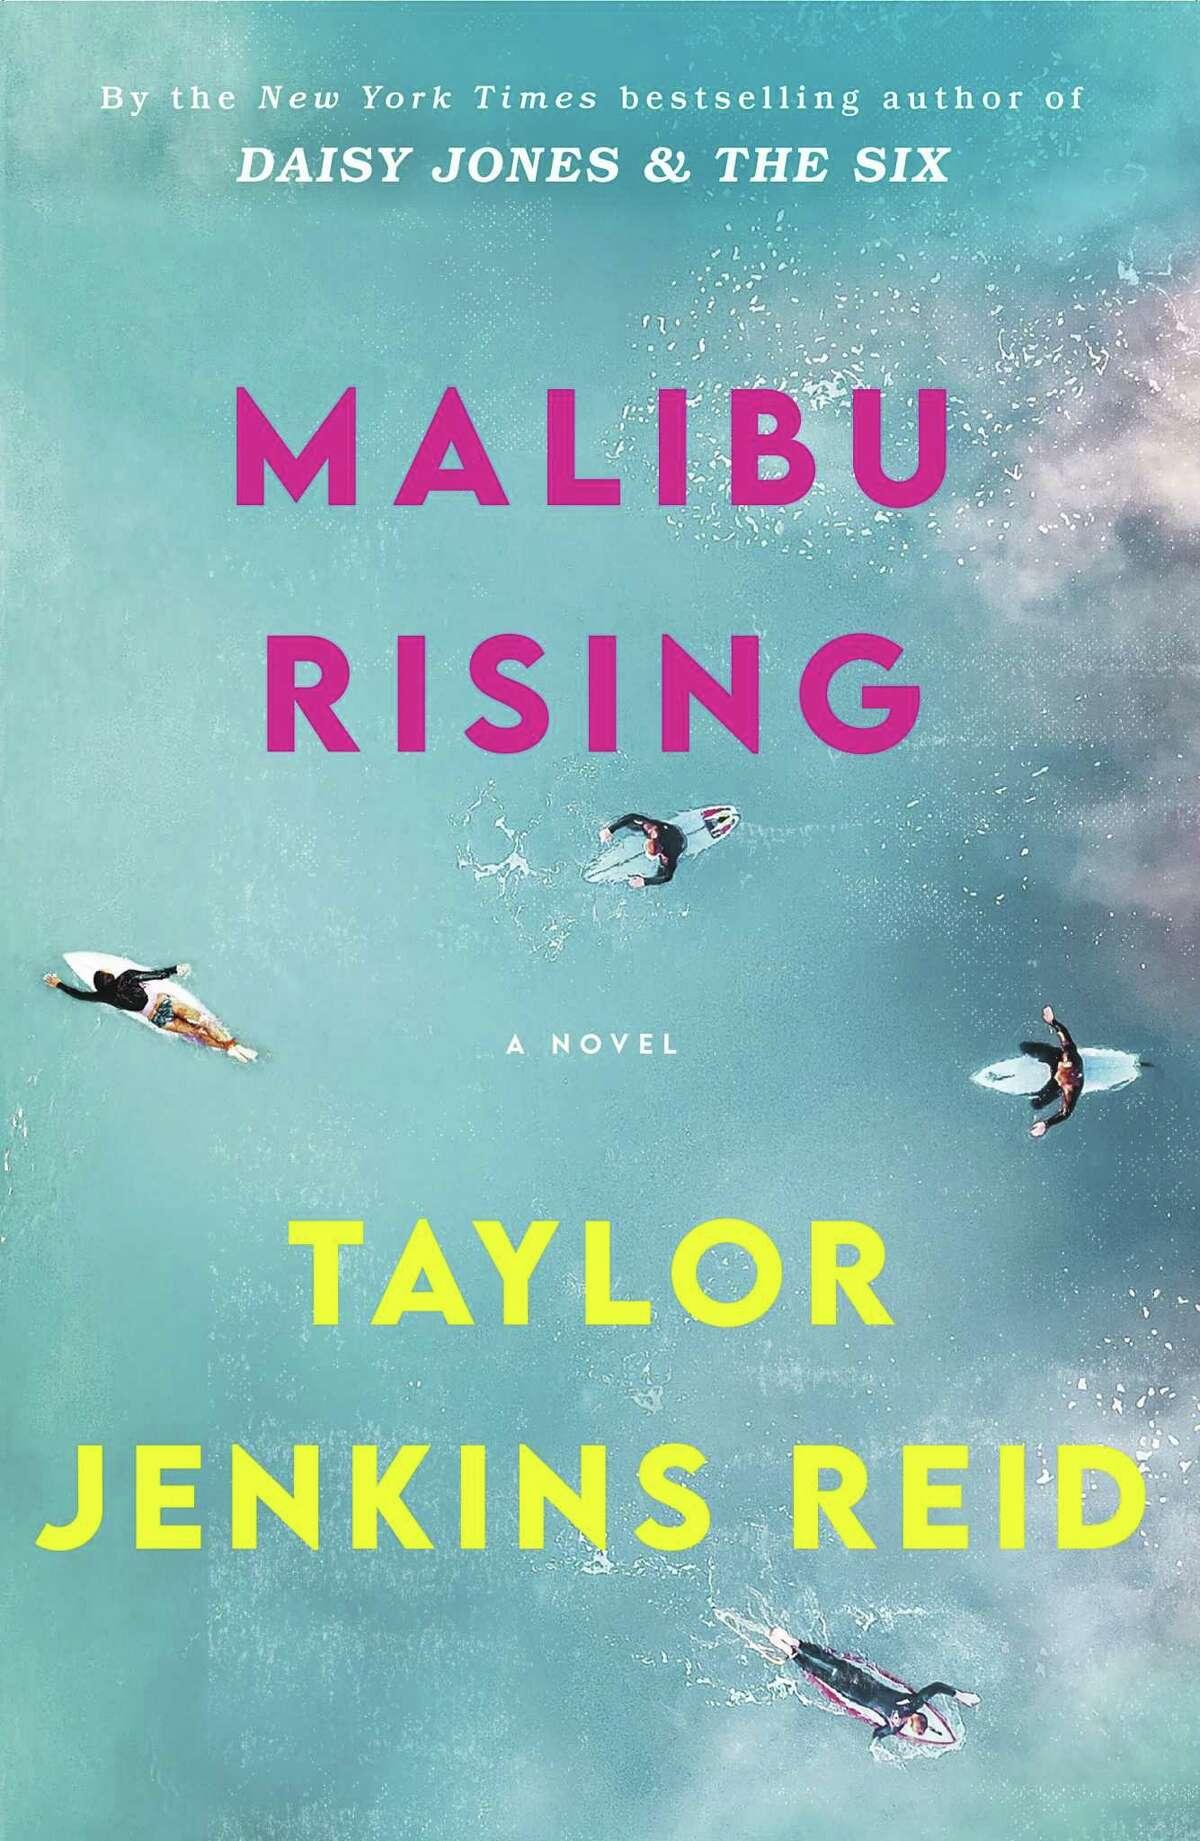 """Malibu Rising"" is Taylor Jenkins Reid's latest novel."